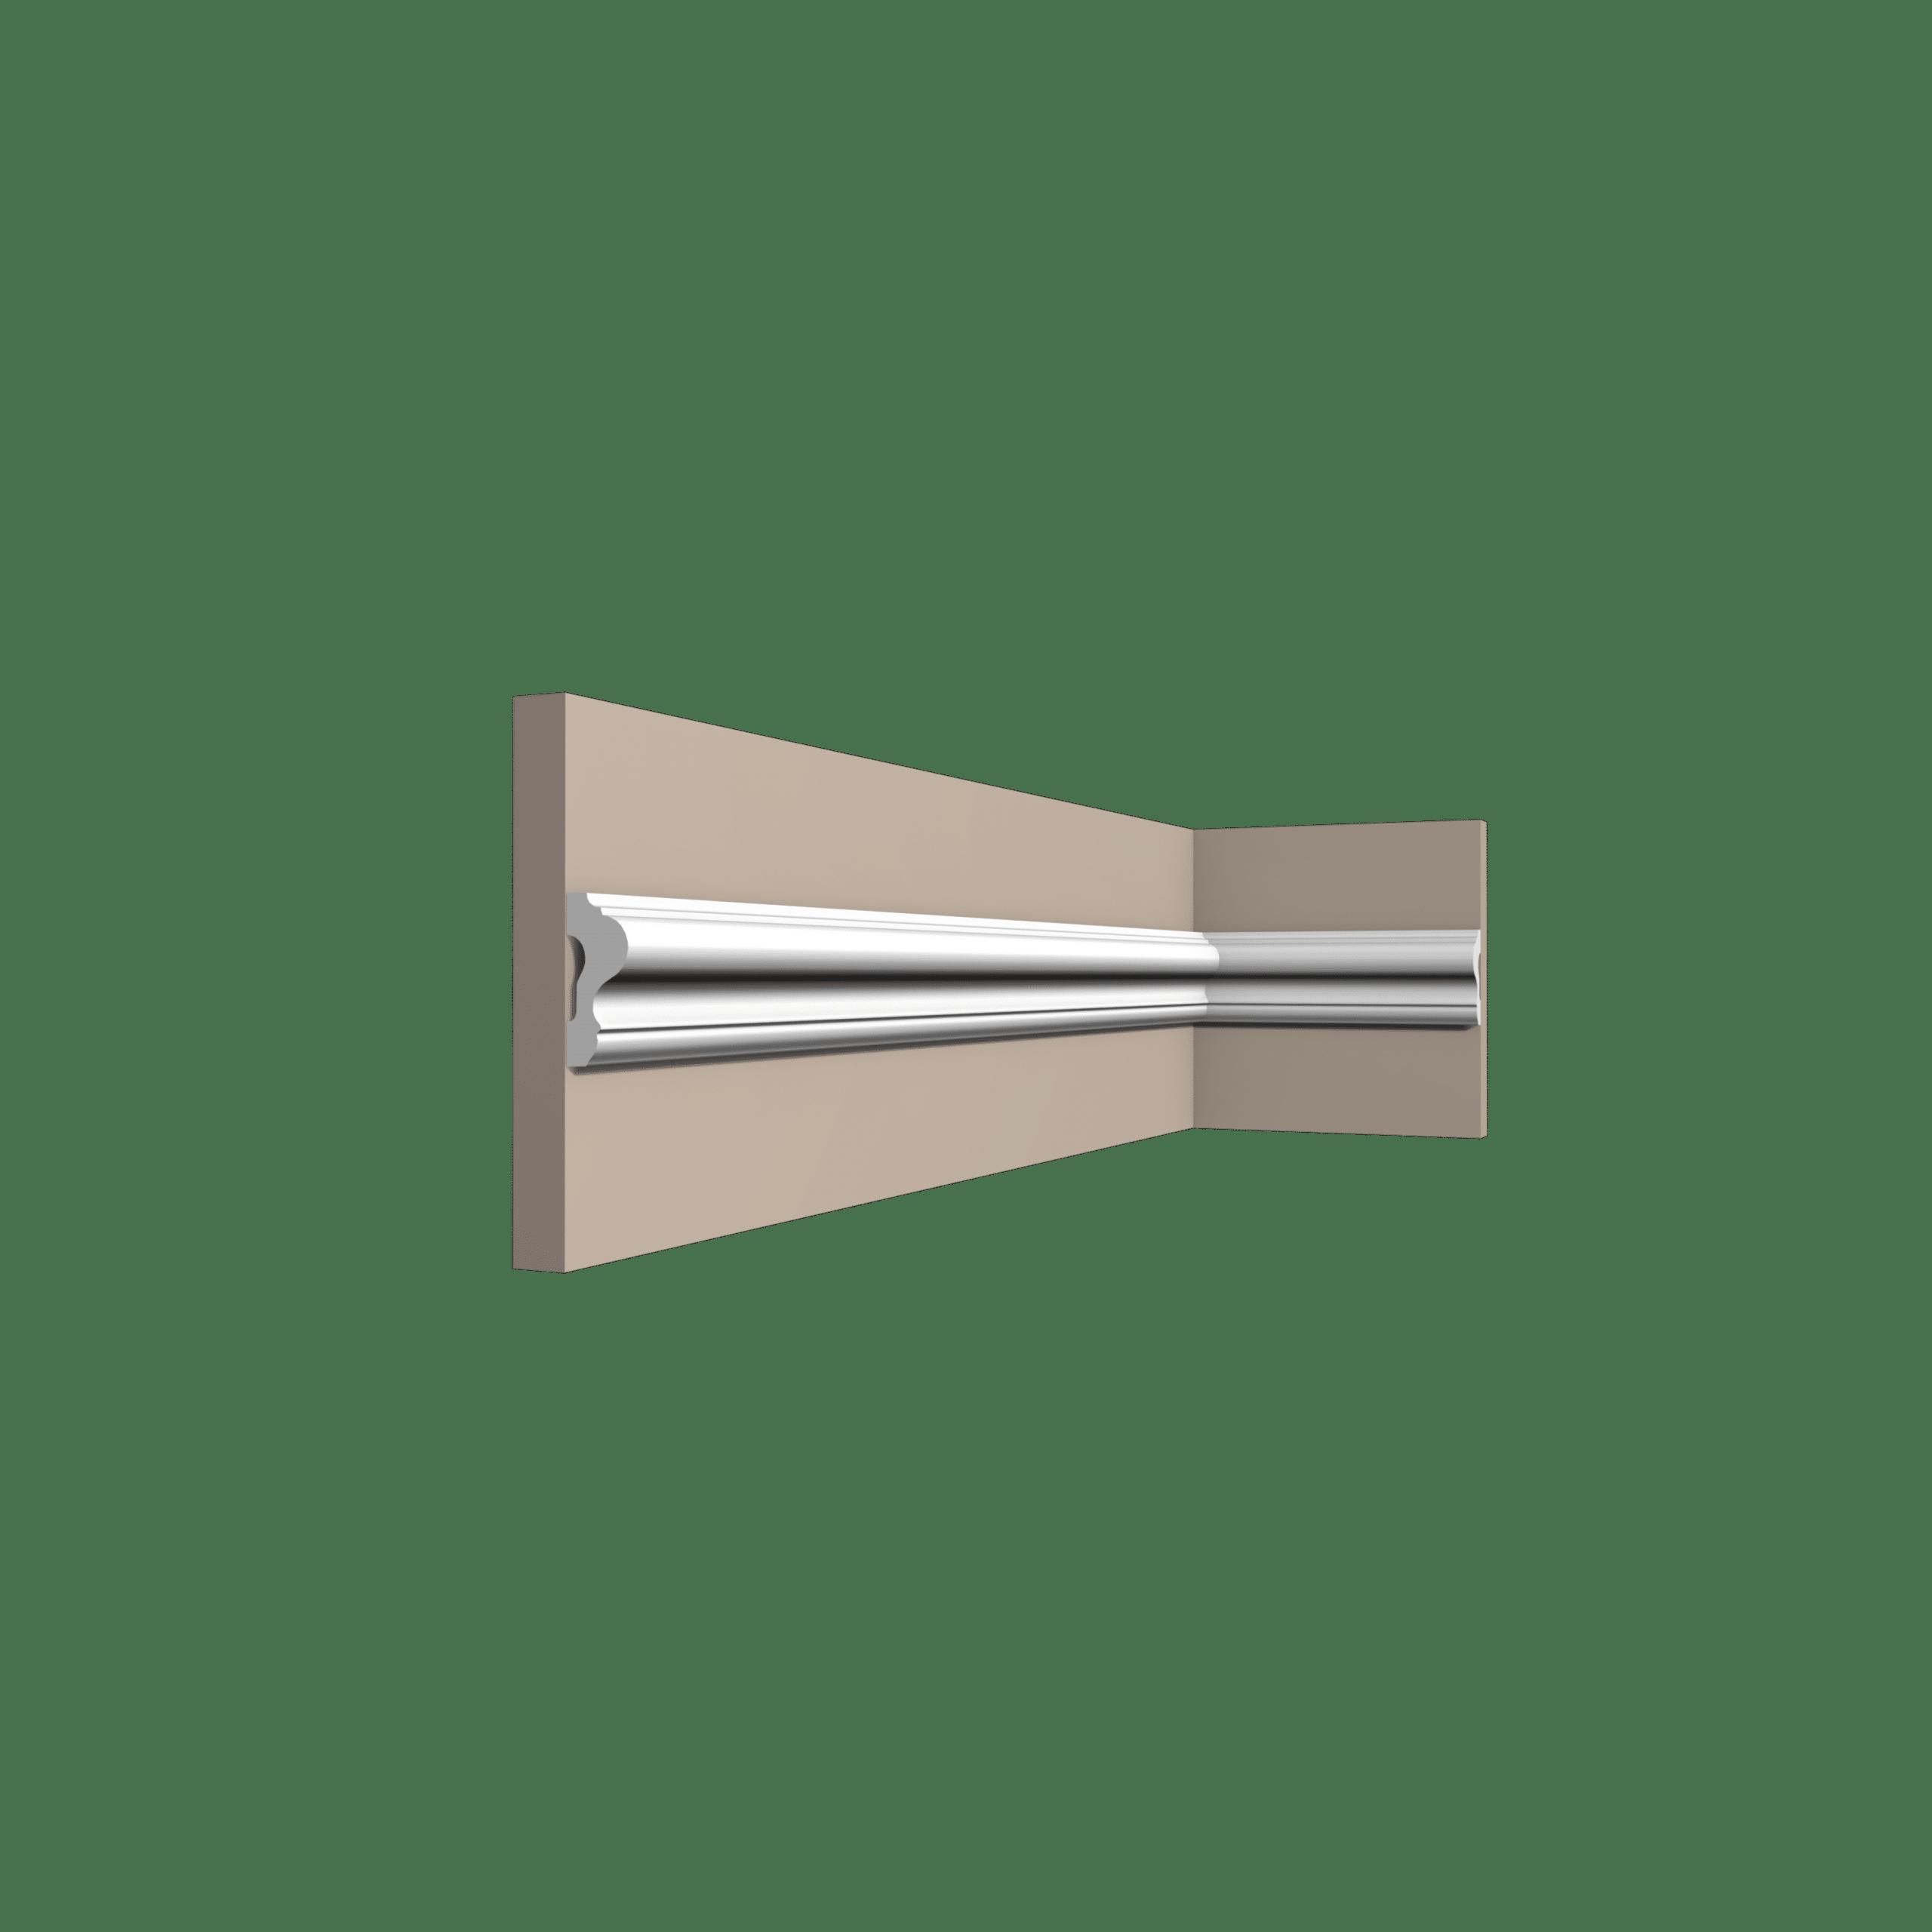 קרניז פוליאוריתן דגם DS - 2553